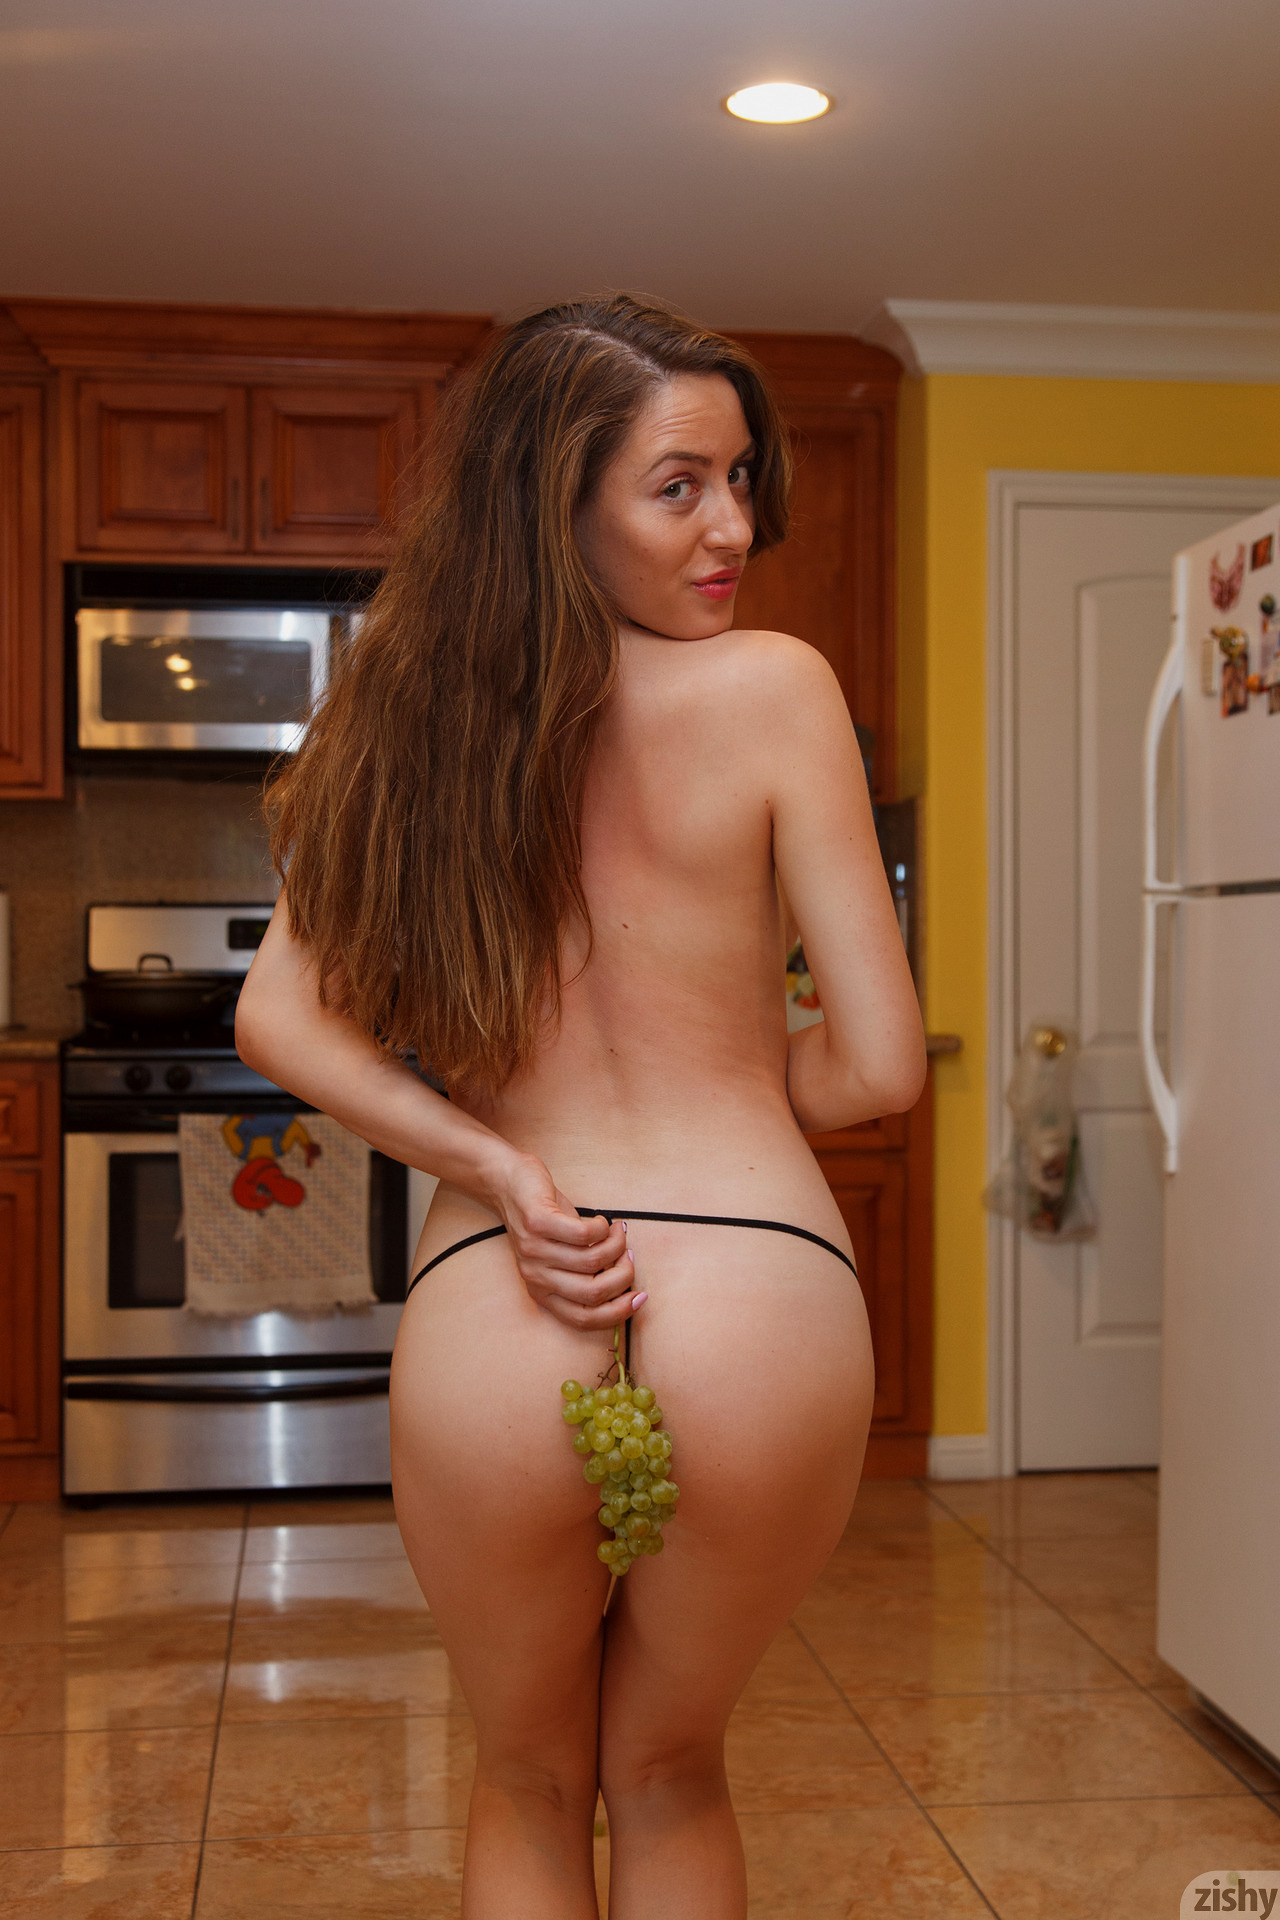 Julia Juliano And The Normal Man Zishy (37)